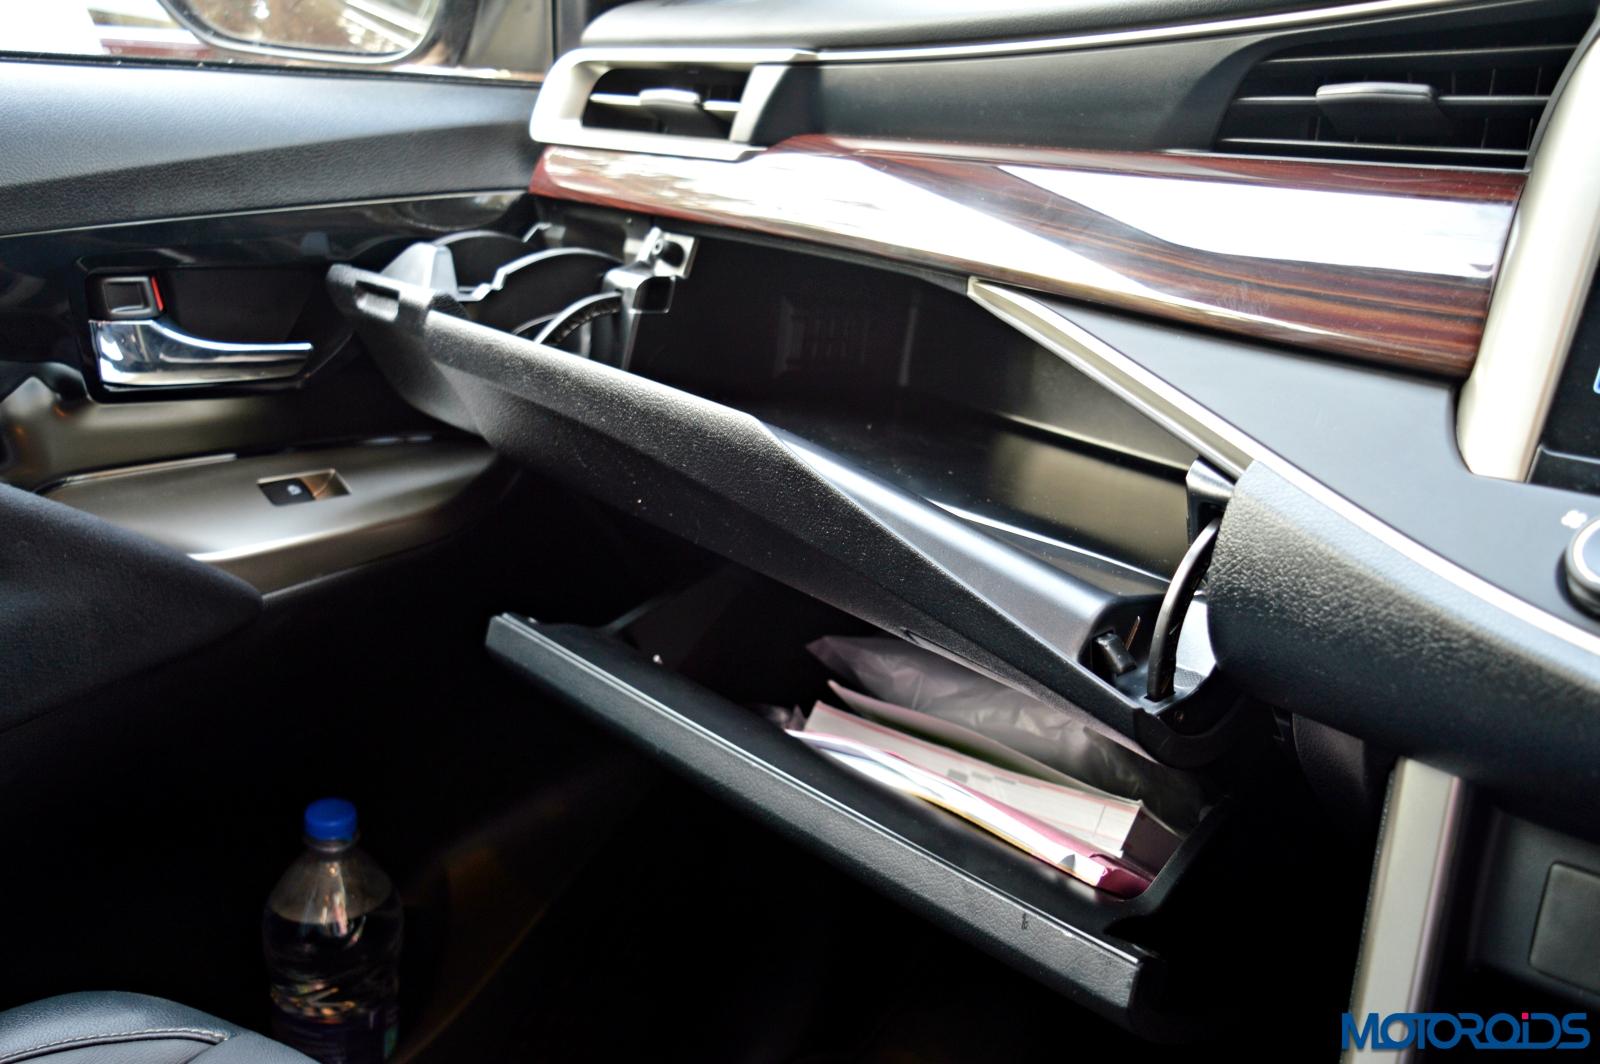 Toyota innova crysta variant wise details explained for Innova interior 8 seater